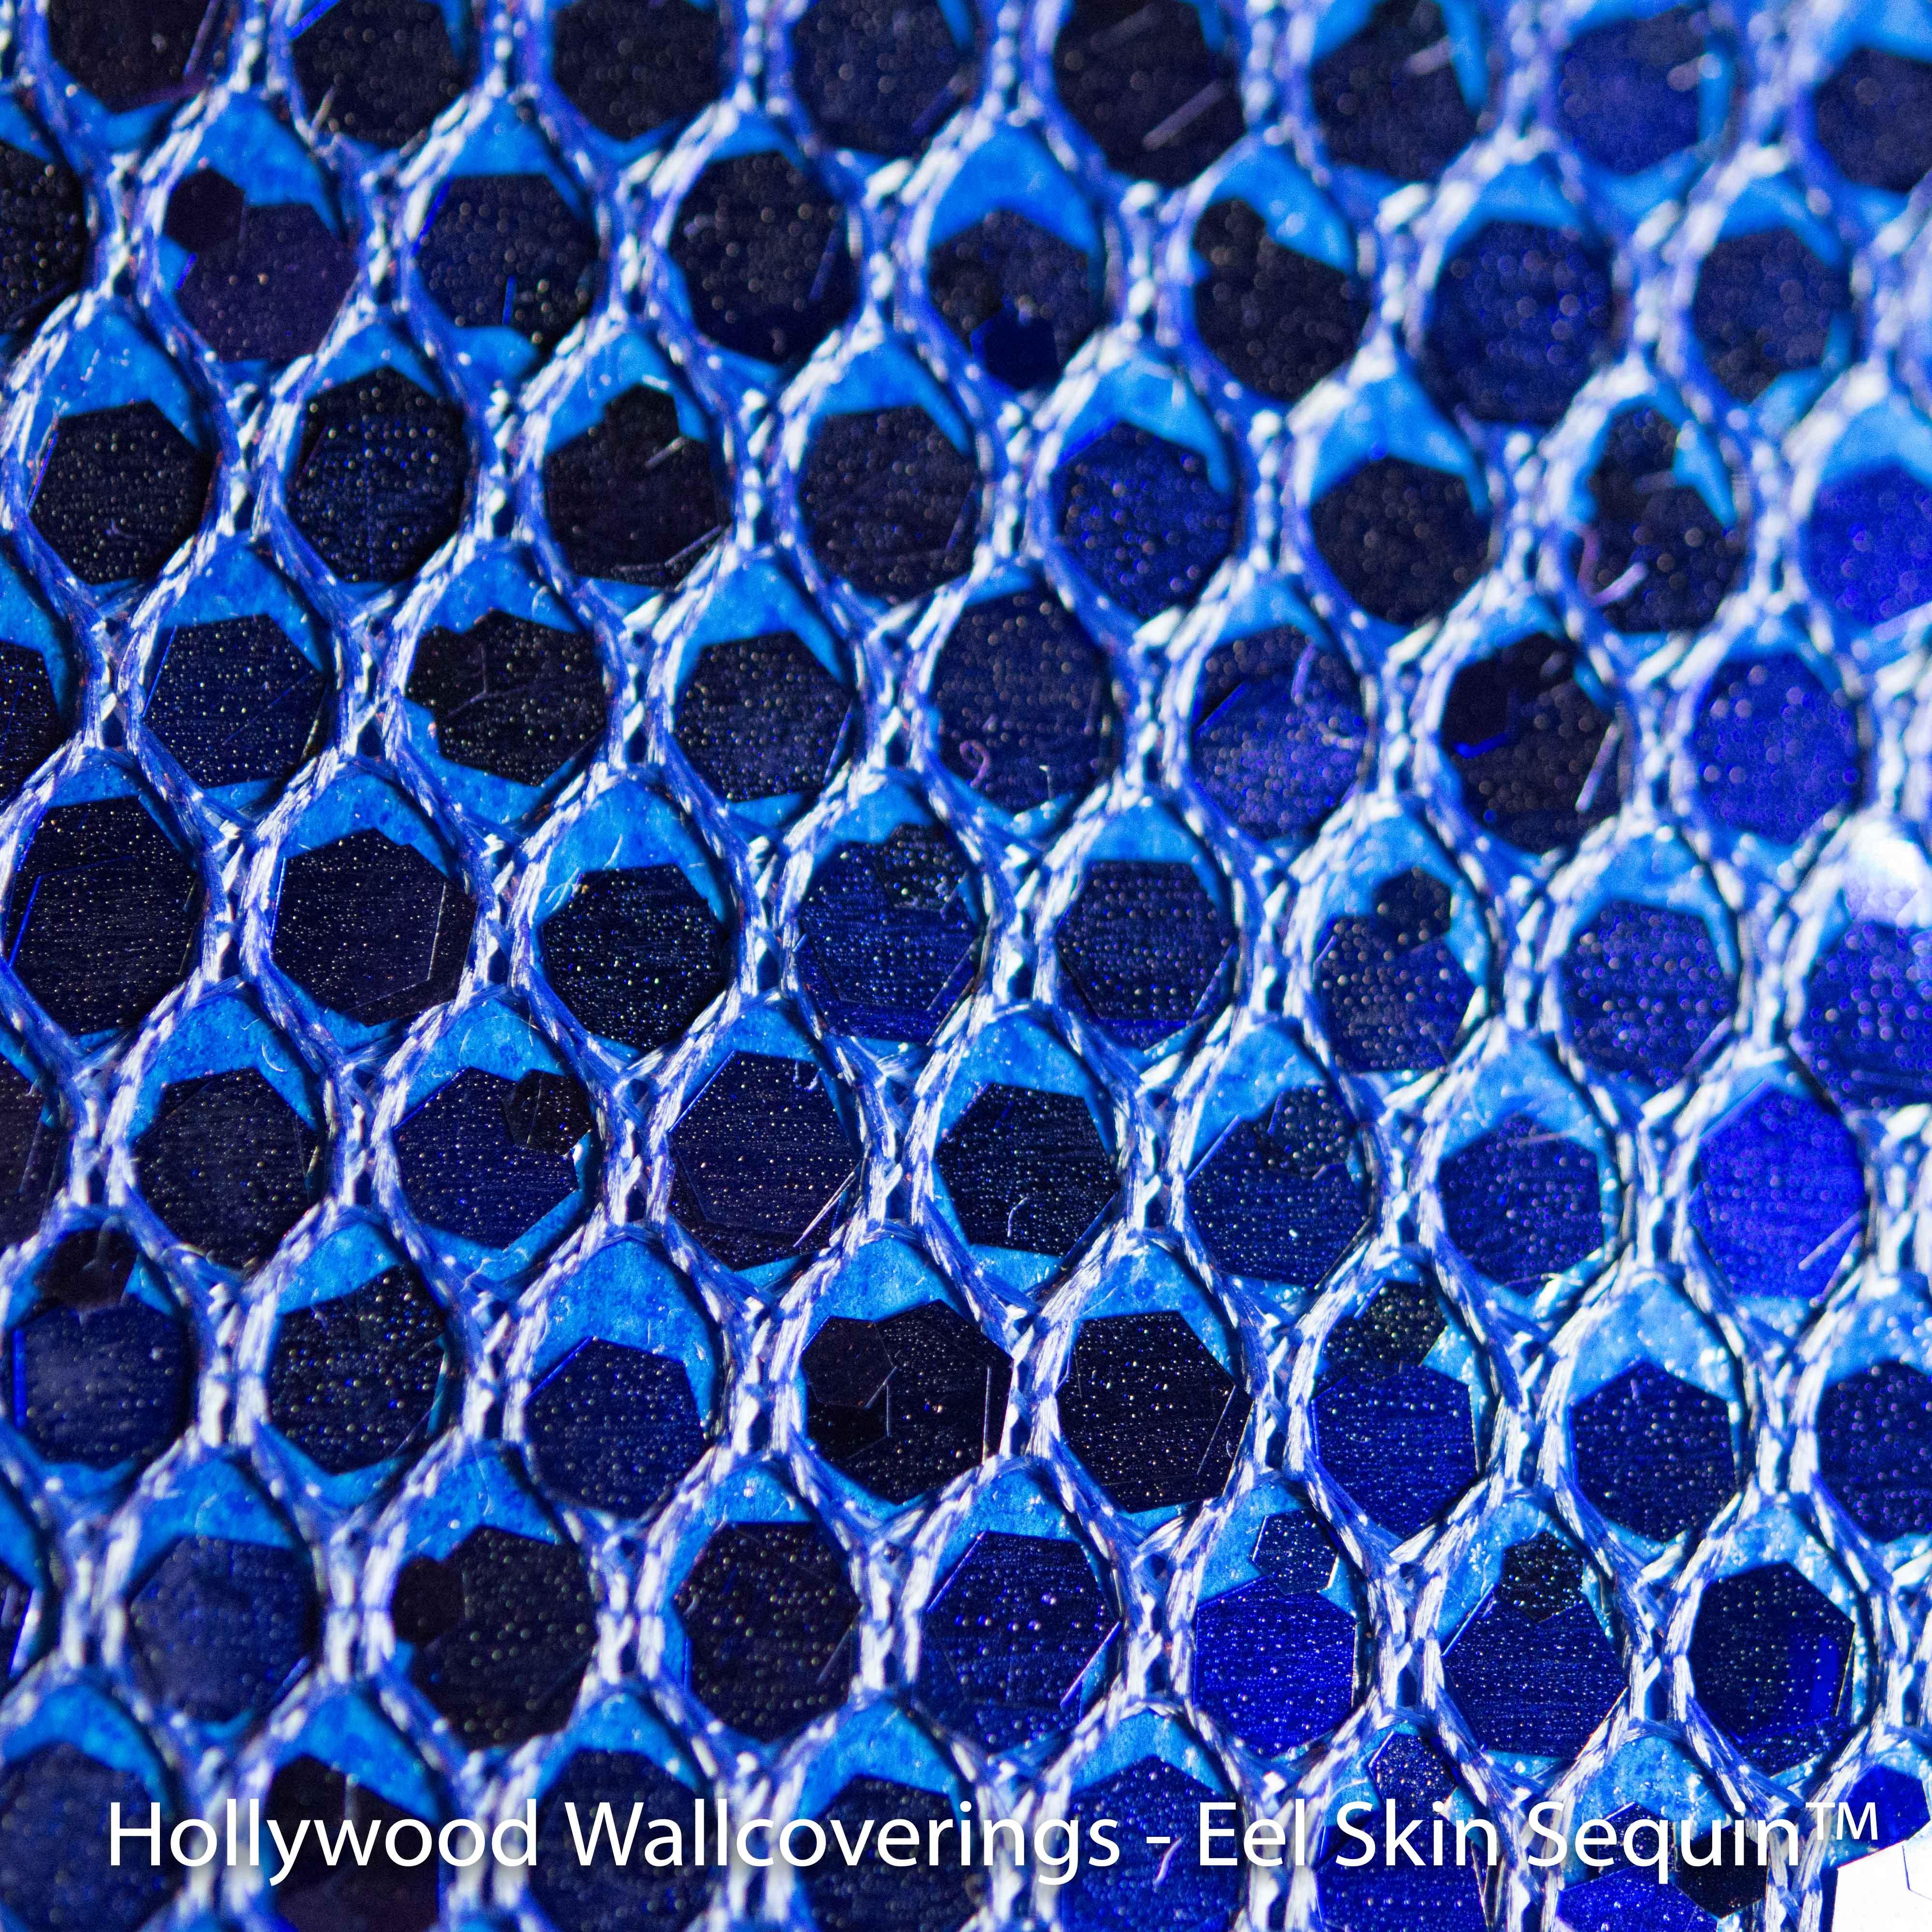 Eel-Skin-Sequin-GLM-Home-Color-Blue-Ray-DesignerWallcoverings-com-Luxury-wallpaper-wp4605606